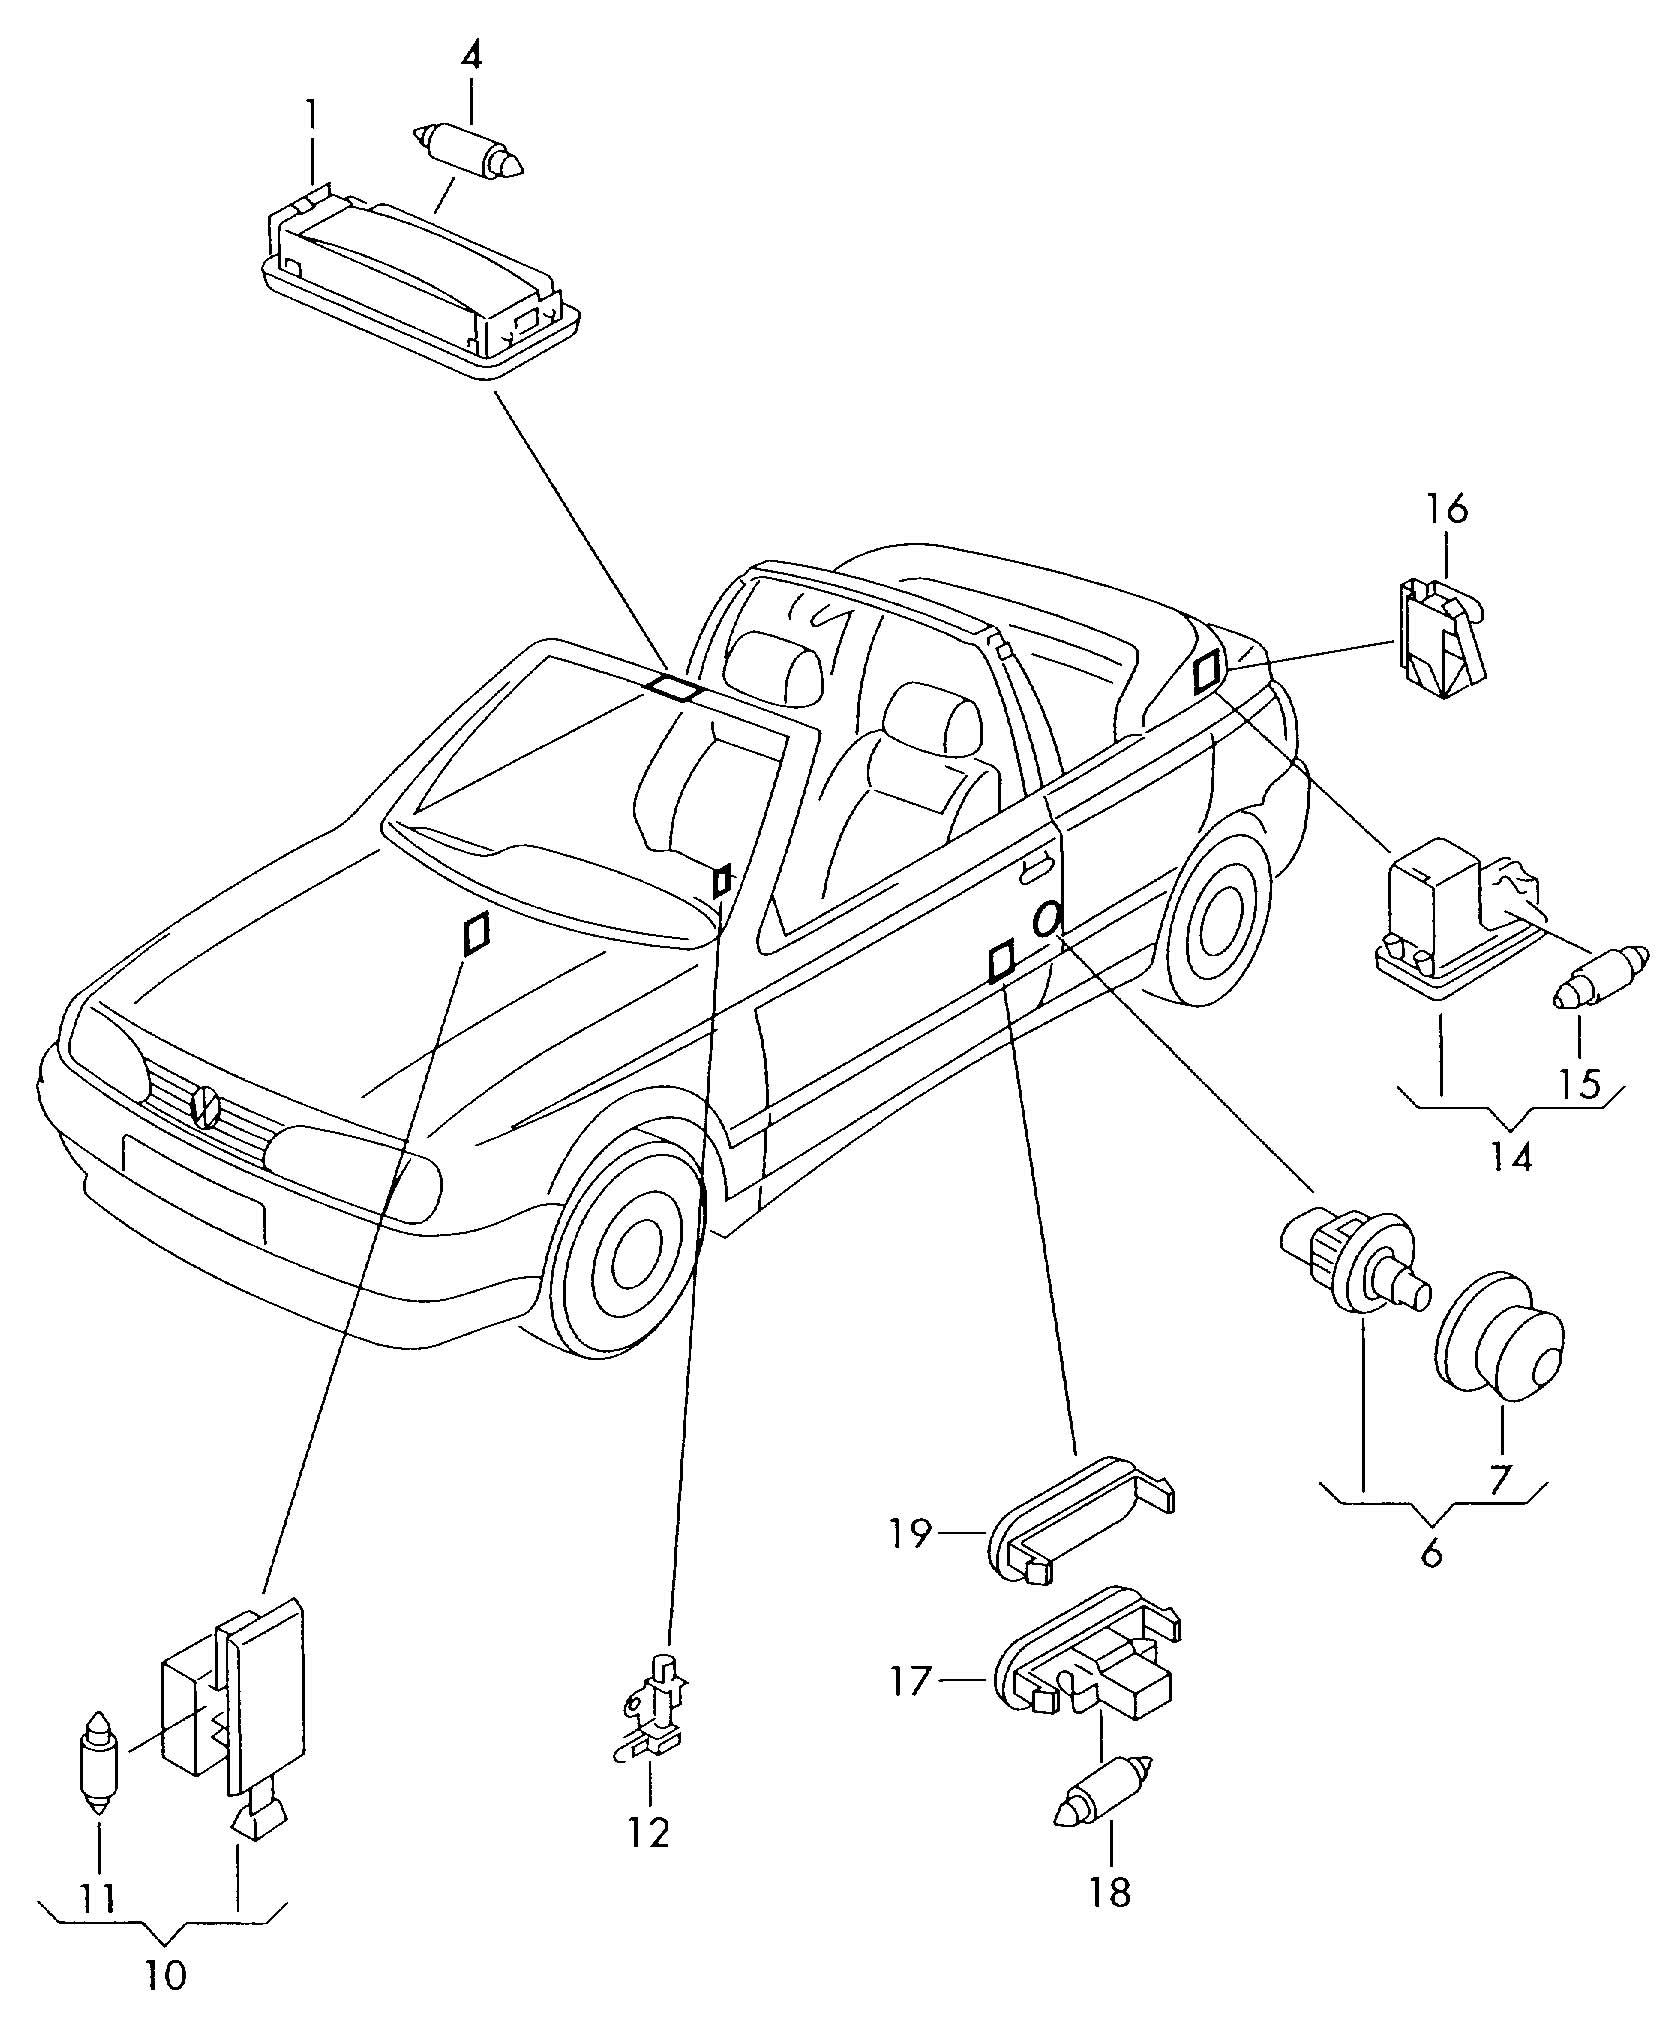 Volkswagen Cabrio Cabriolet Luggage Compartment Light Glove Box Light Interior Light Switch